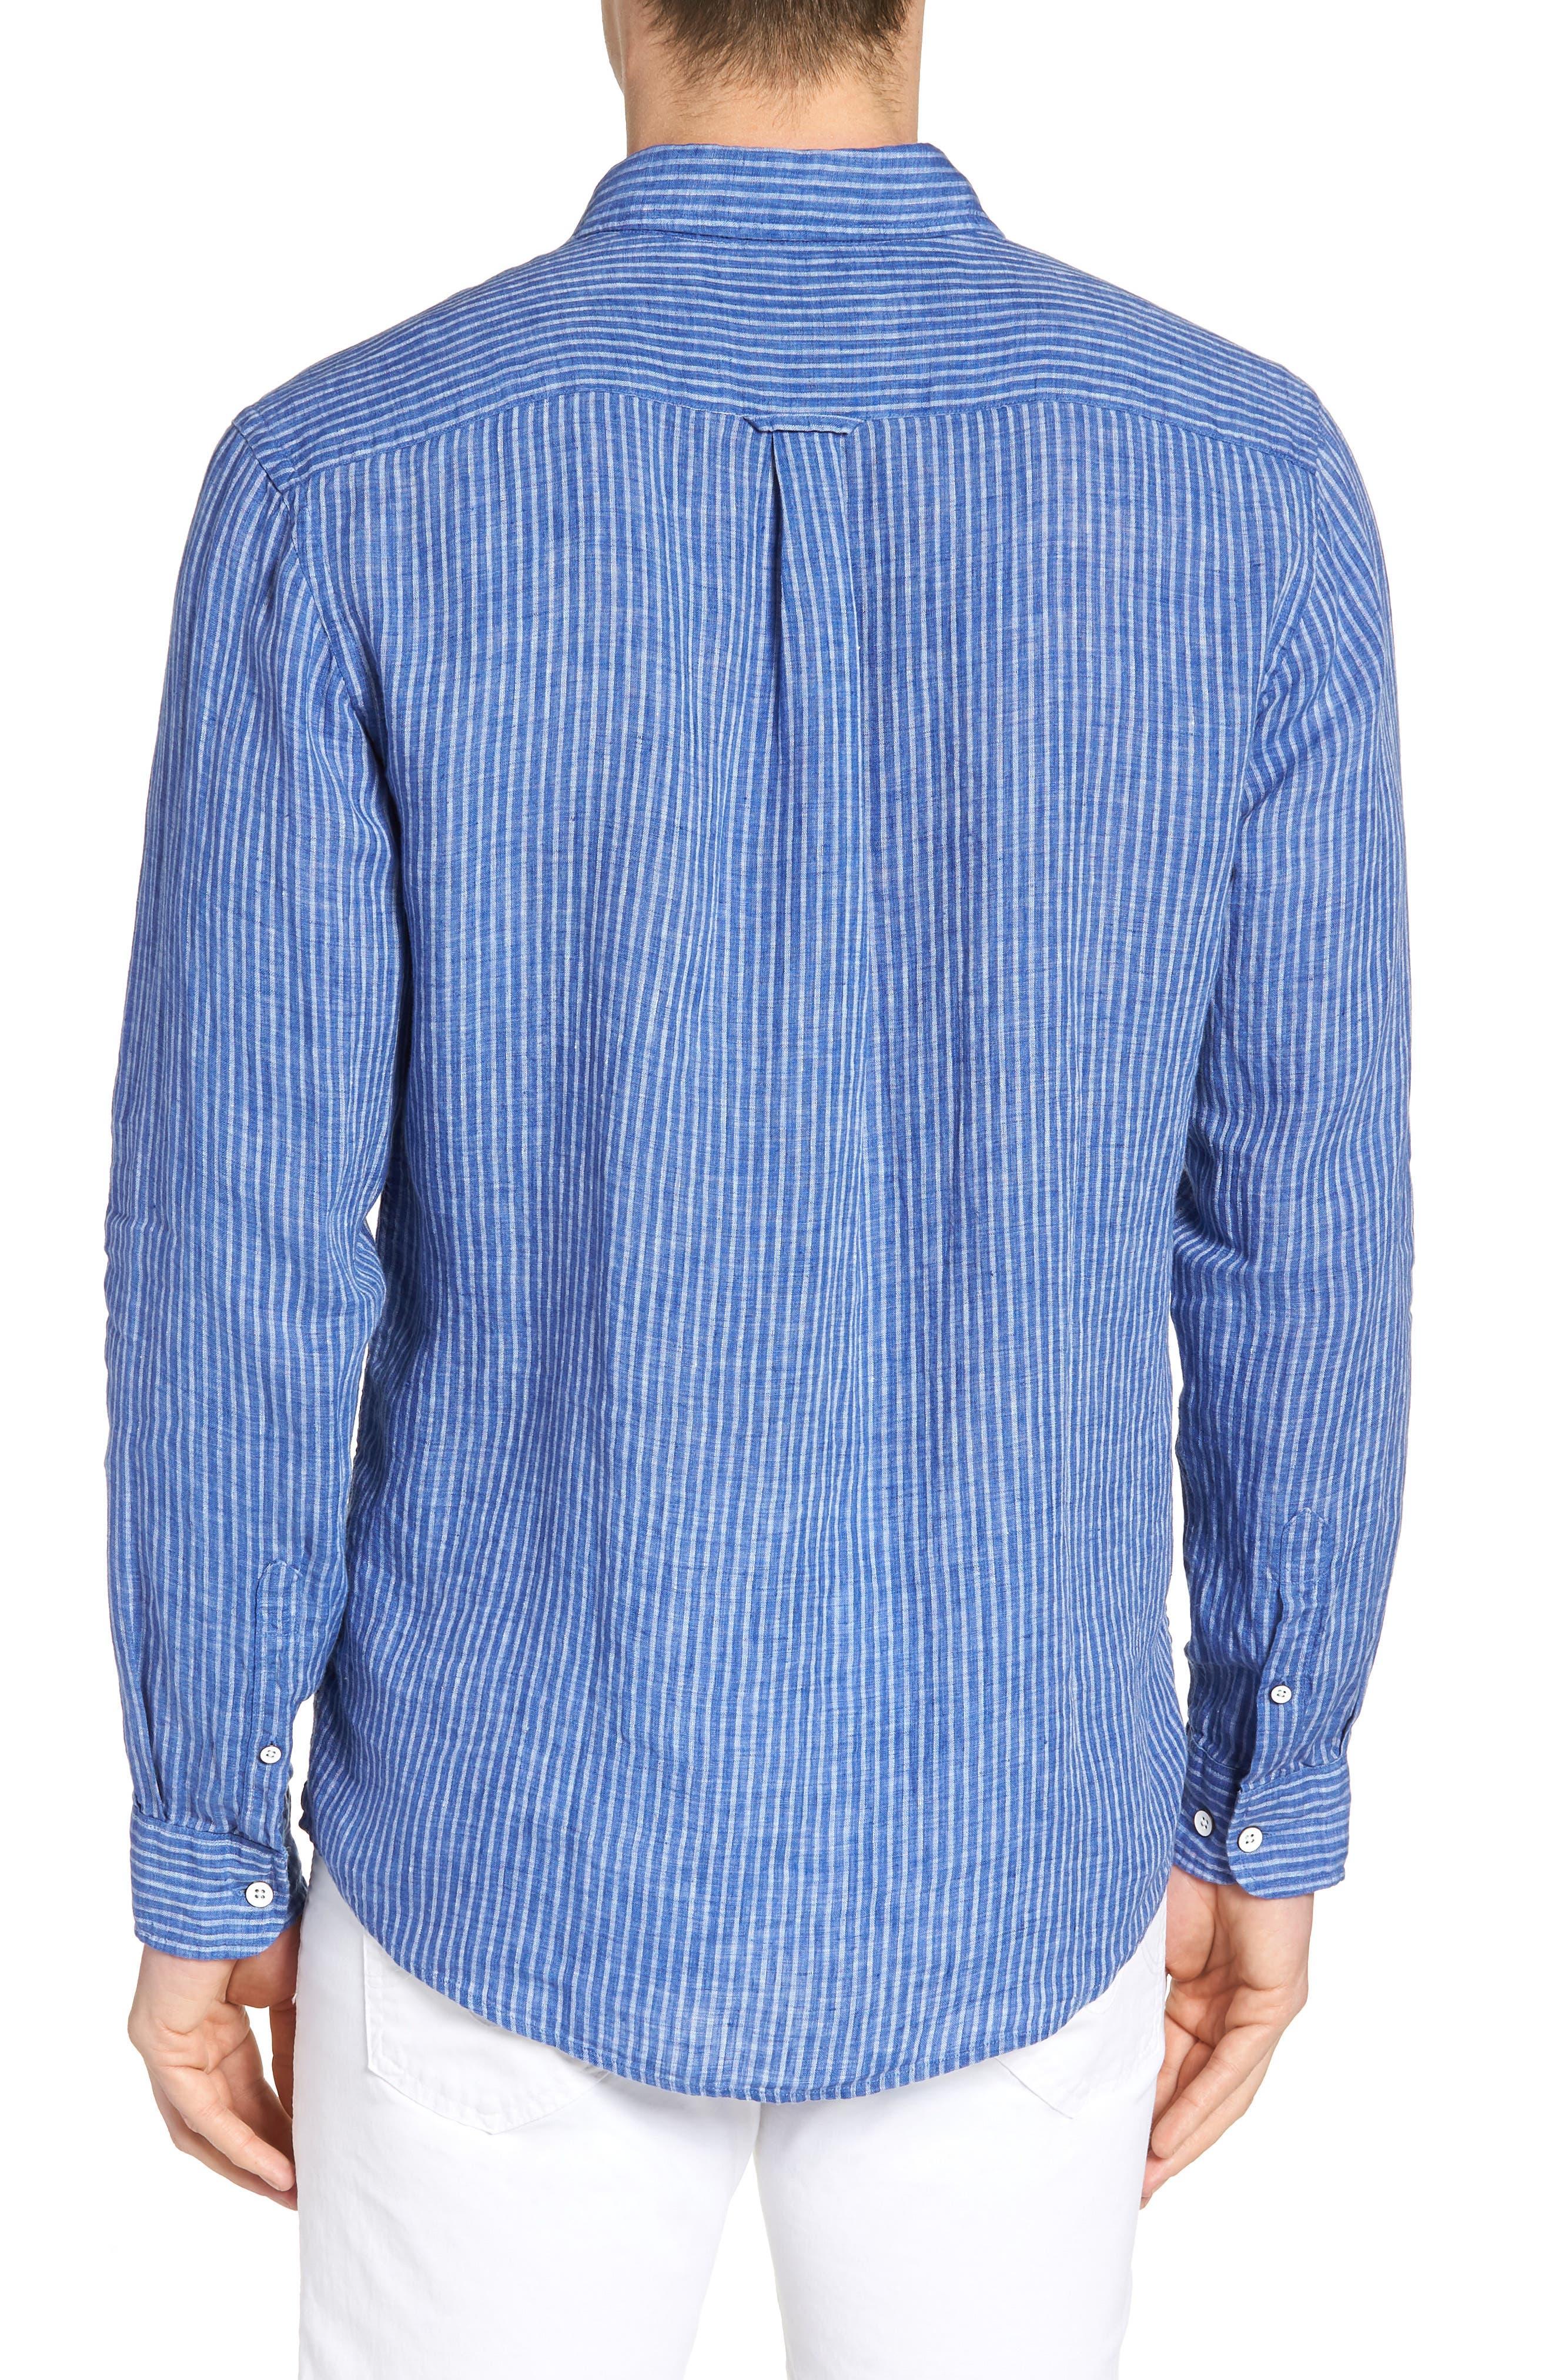 Warwick Junction Stripe Linen Sport Shirt,                             Alternate thumbnail 2, color,                             ULTRAMARINE